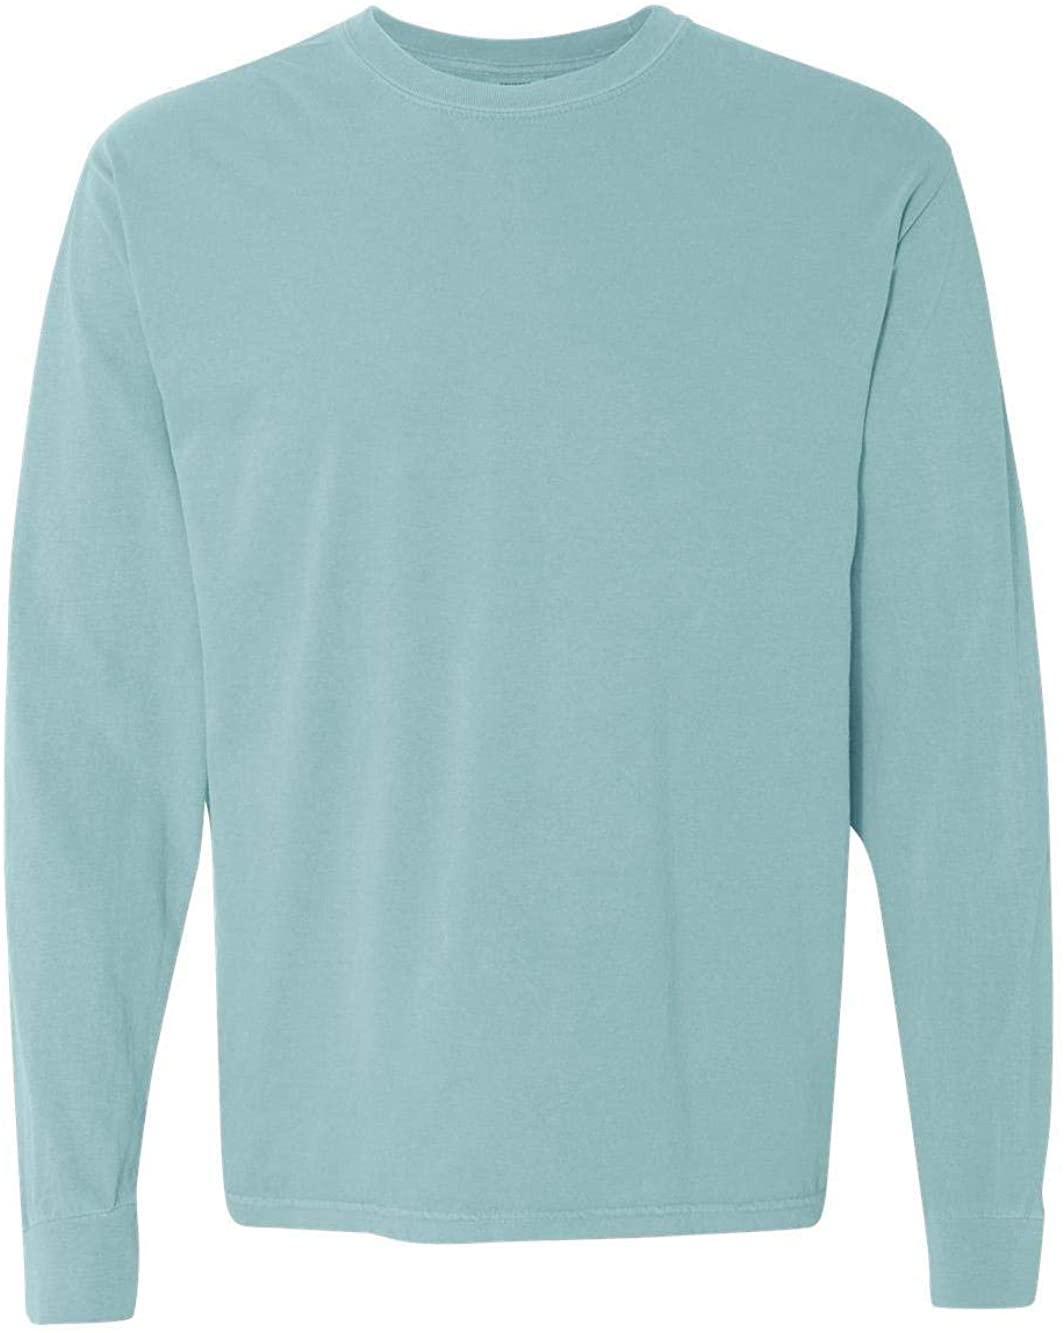 Comfort Colors Ringspun Garment-Dyed Long-Sleeve T-Shirt (C6014)